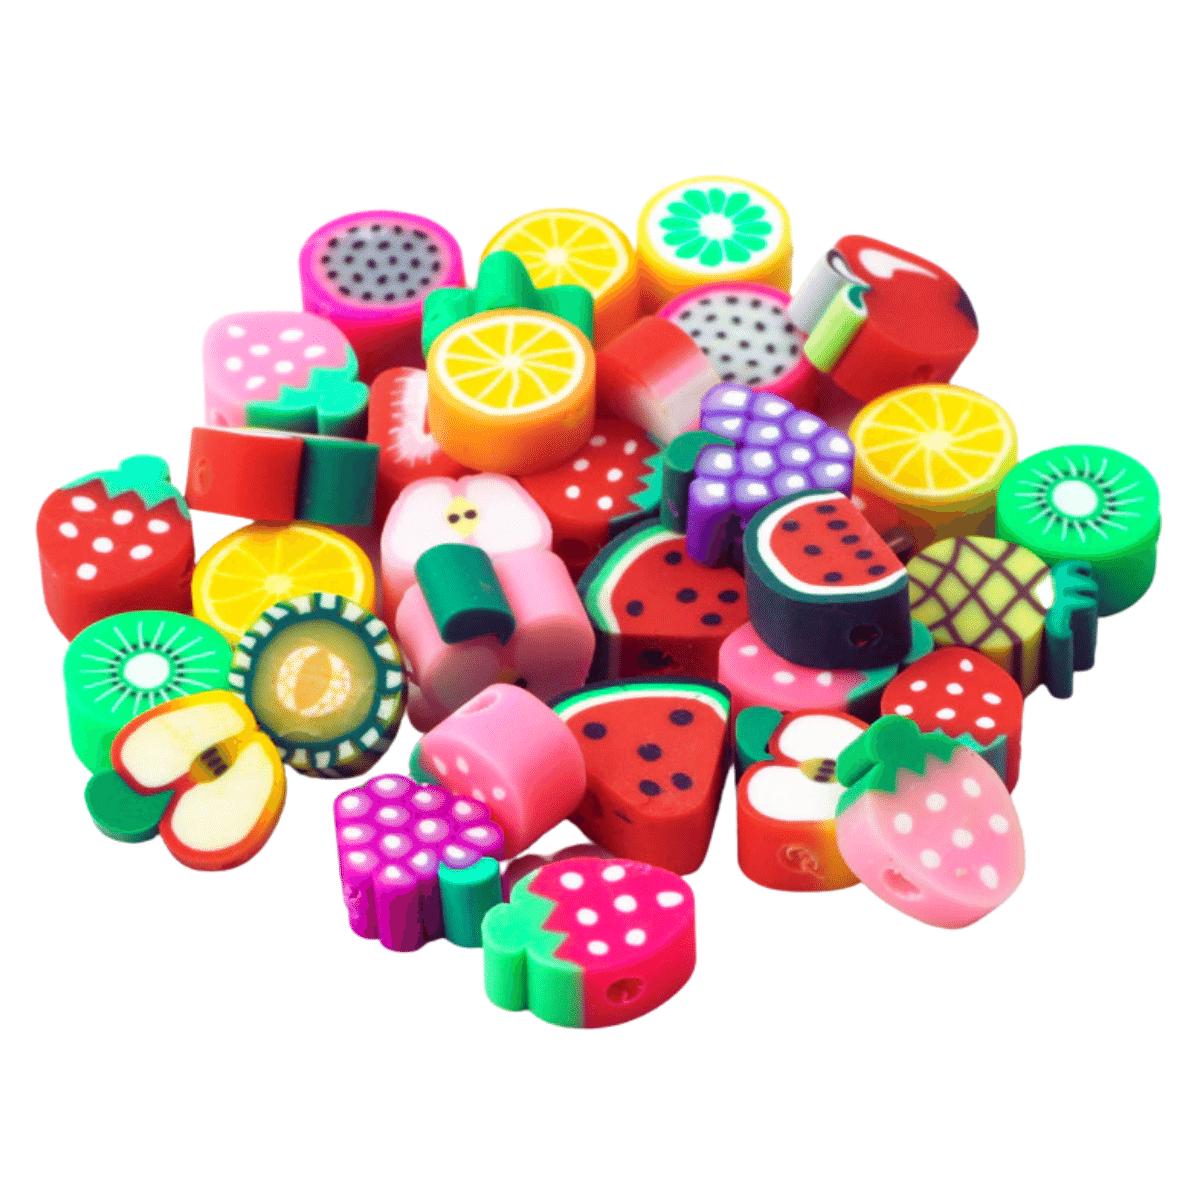 Früchte Perlen 40 Stück 10mm, Obstperlen aus Polymer Clay